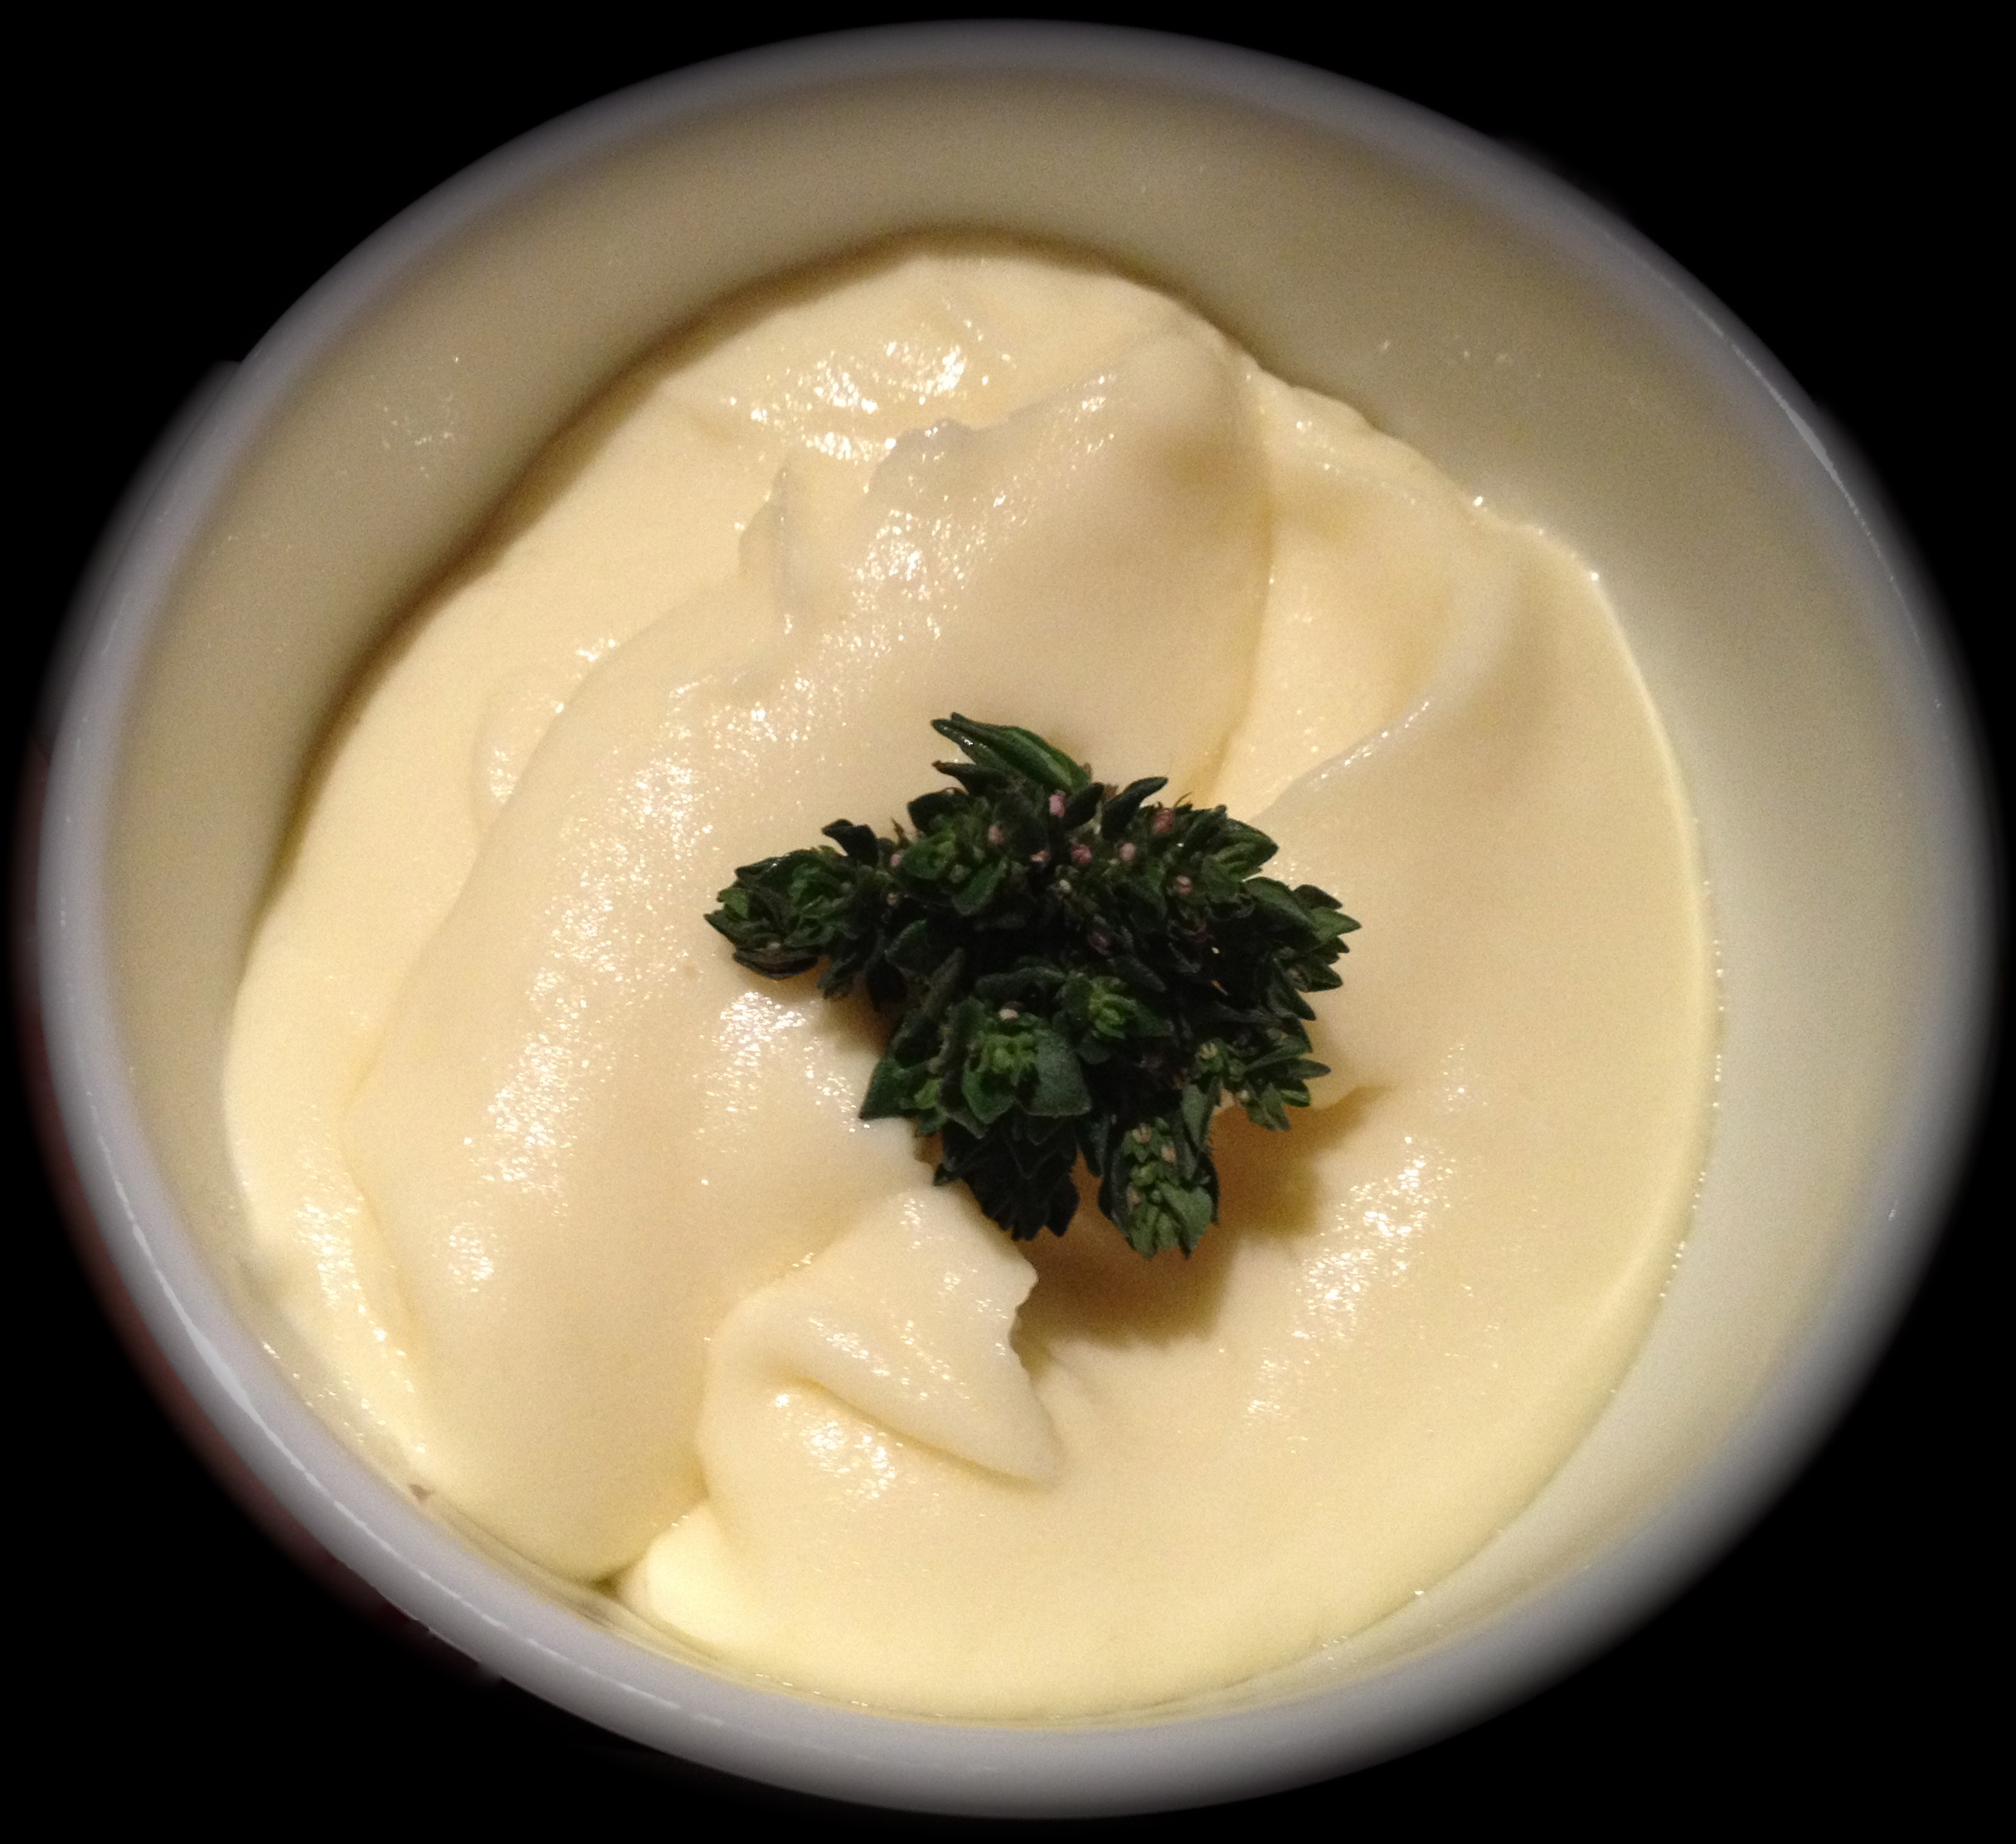 Mashed potatoes a la Joel Robuchon